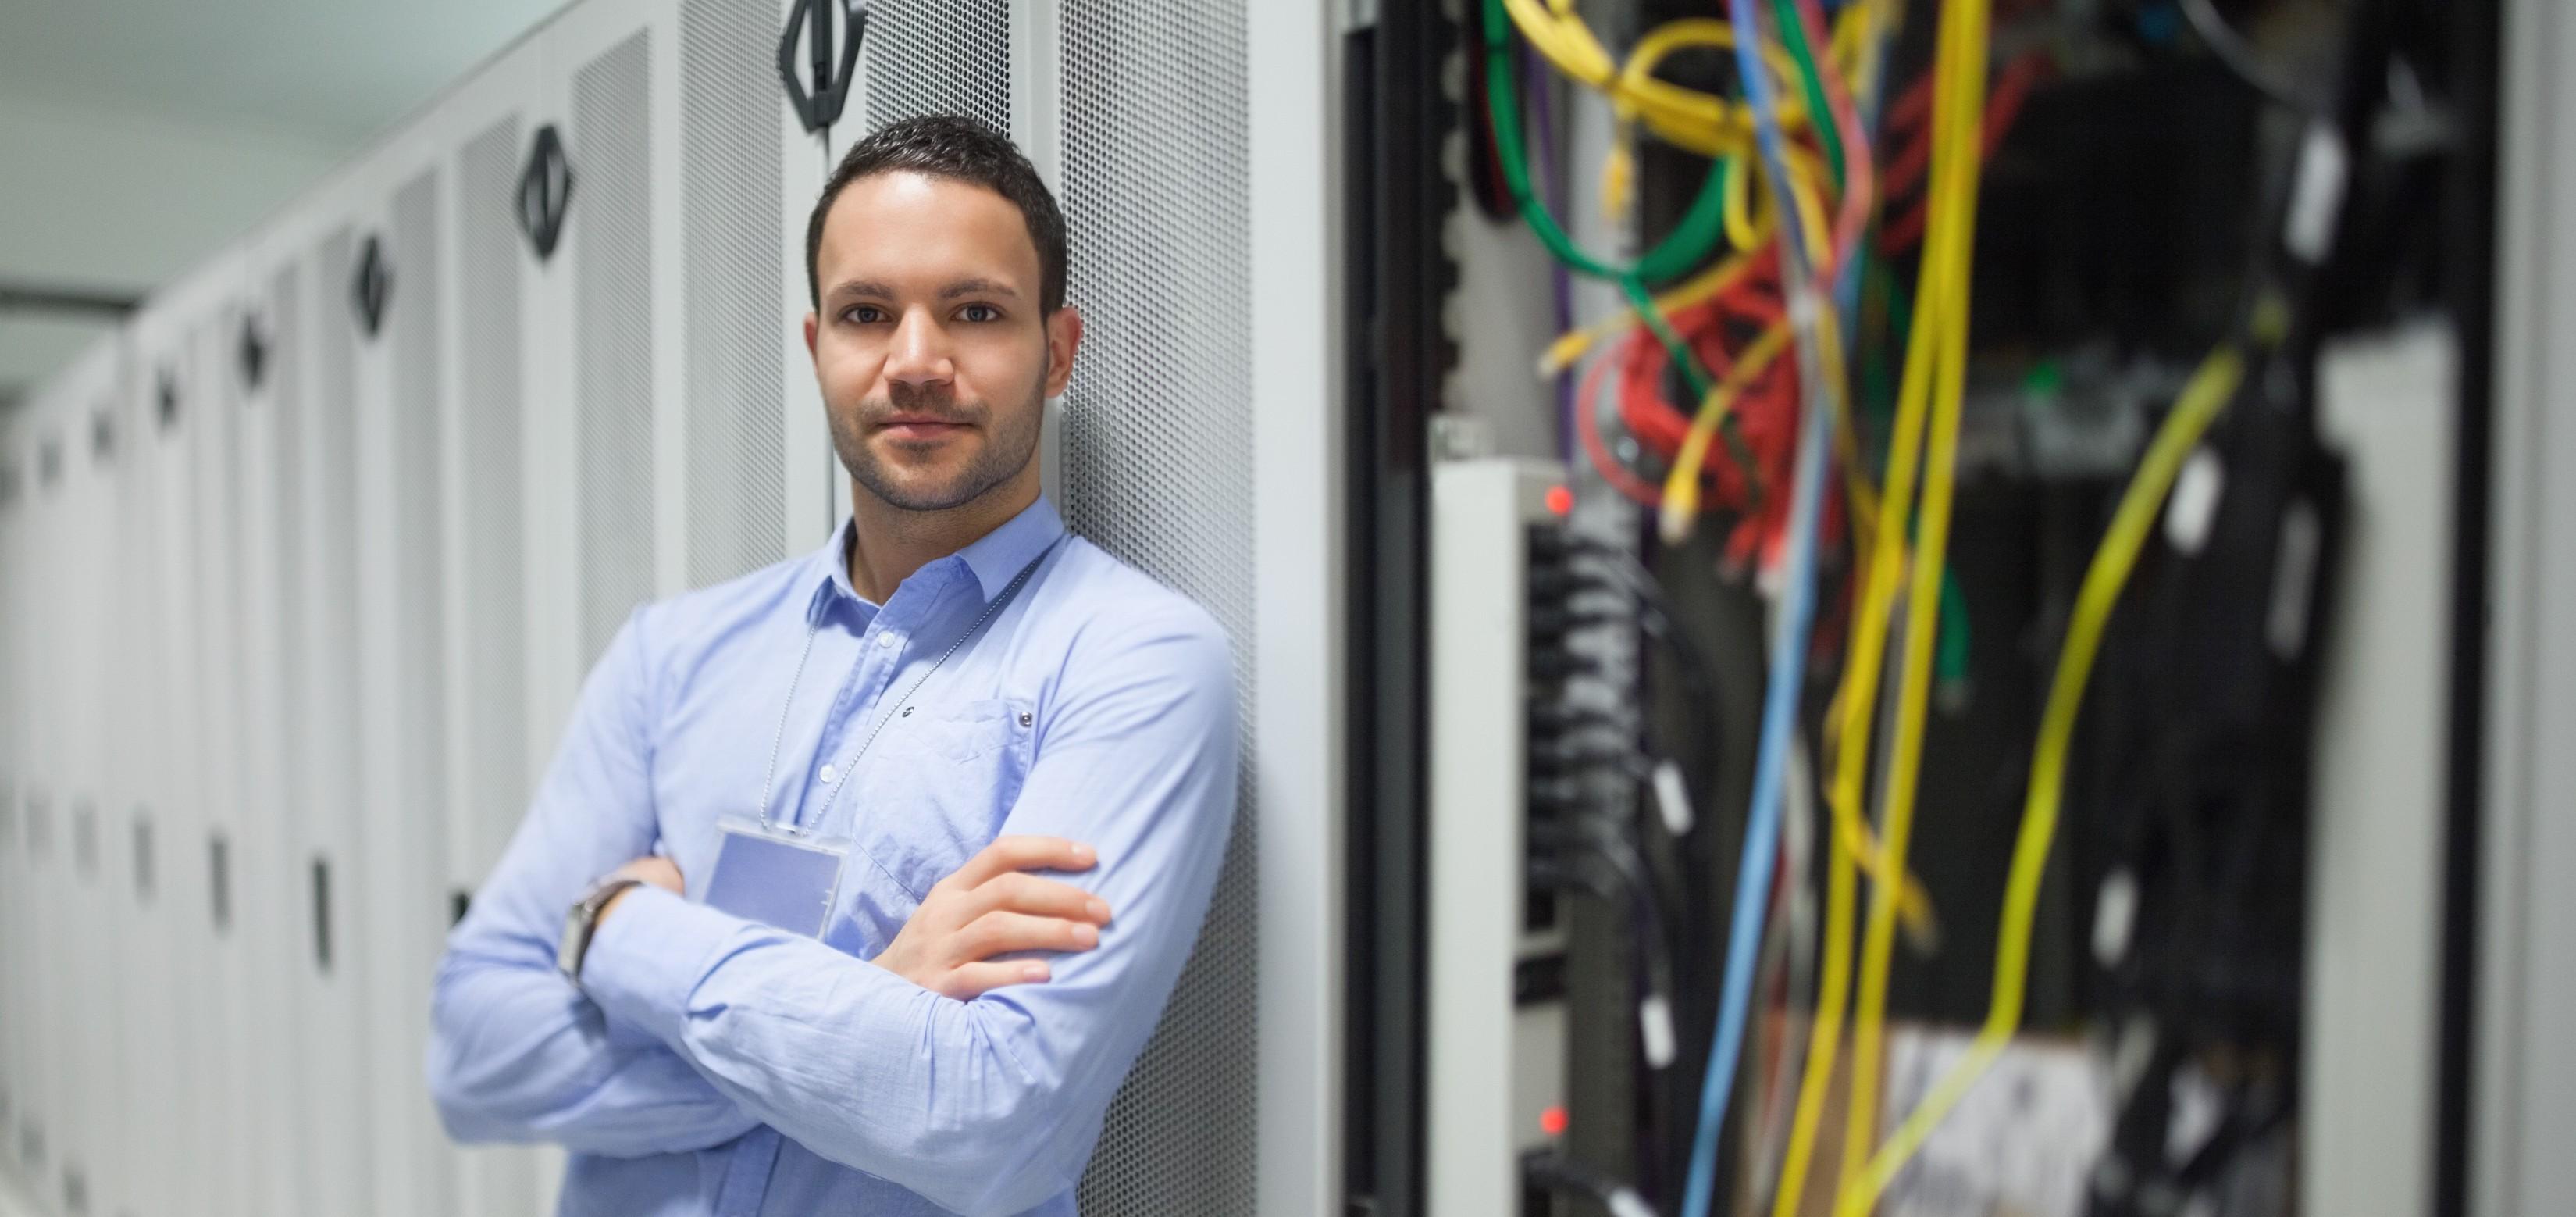 system-administrator-appreciation-day1-e1434969475800